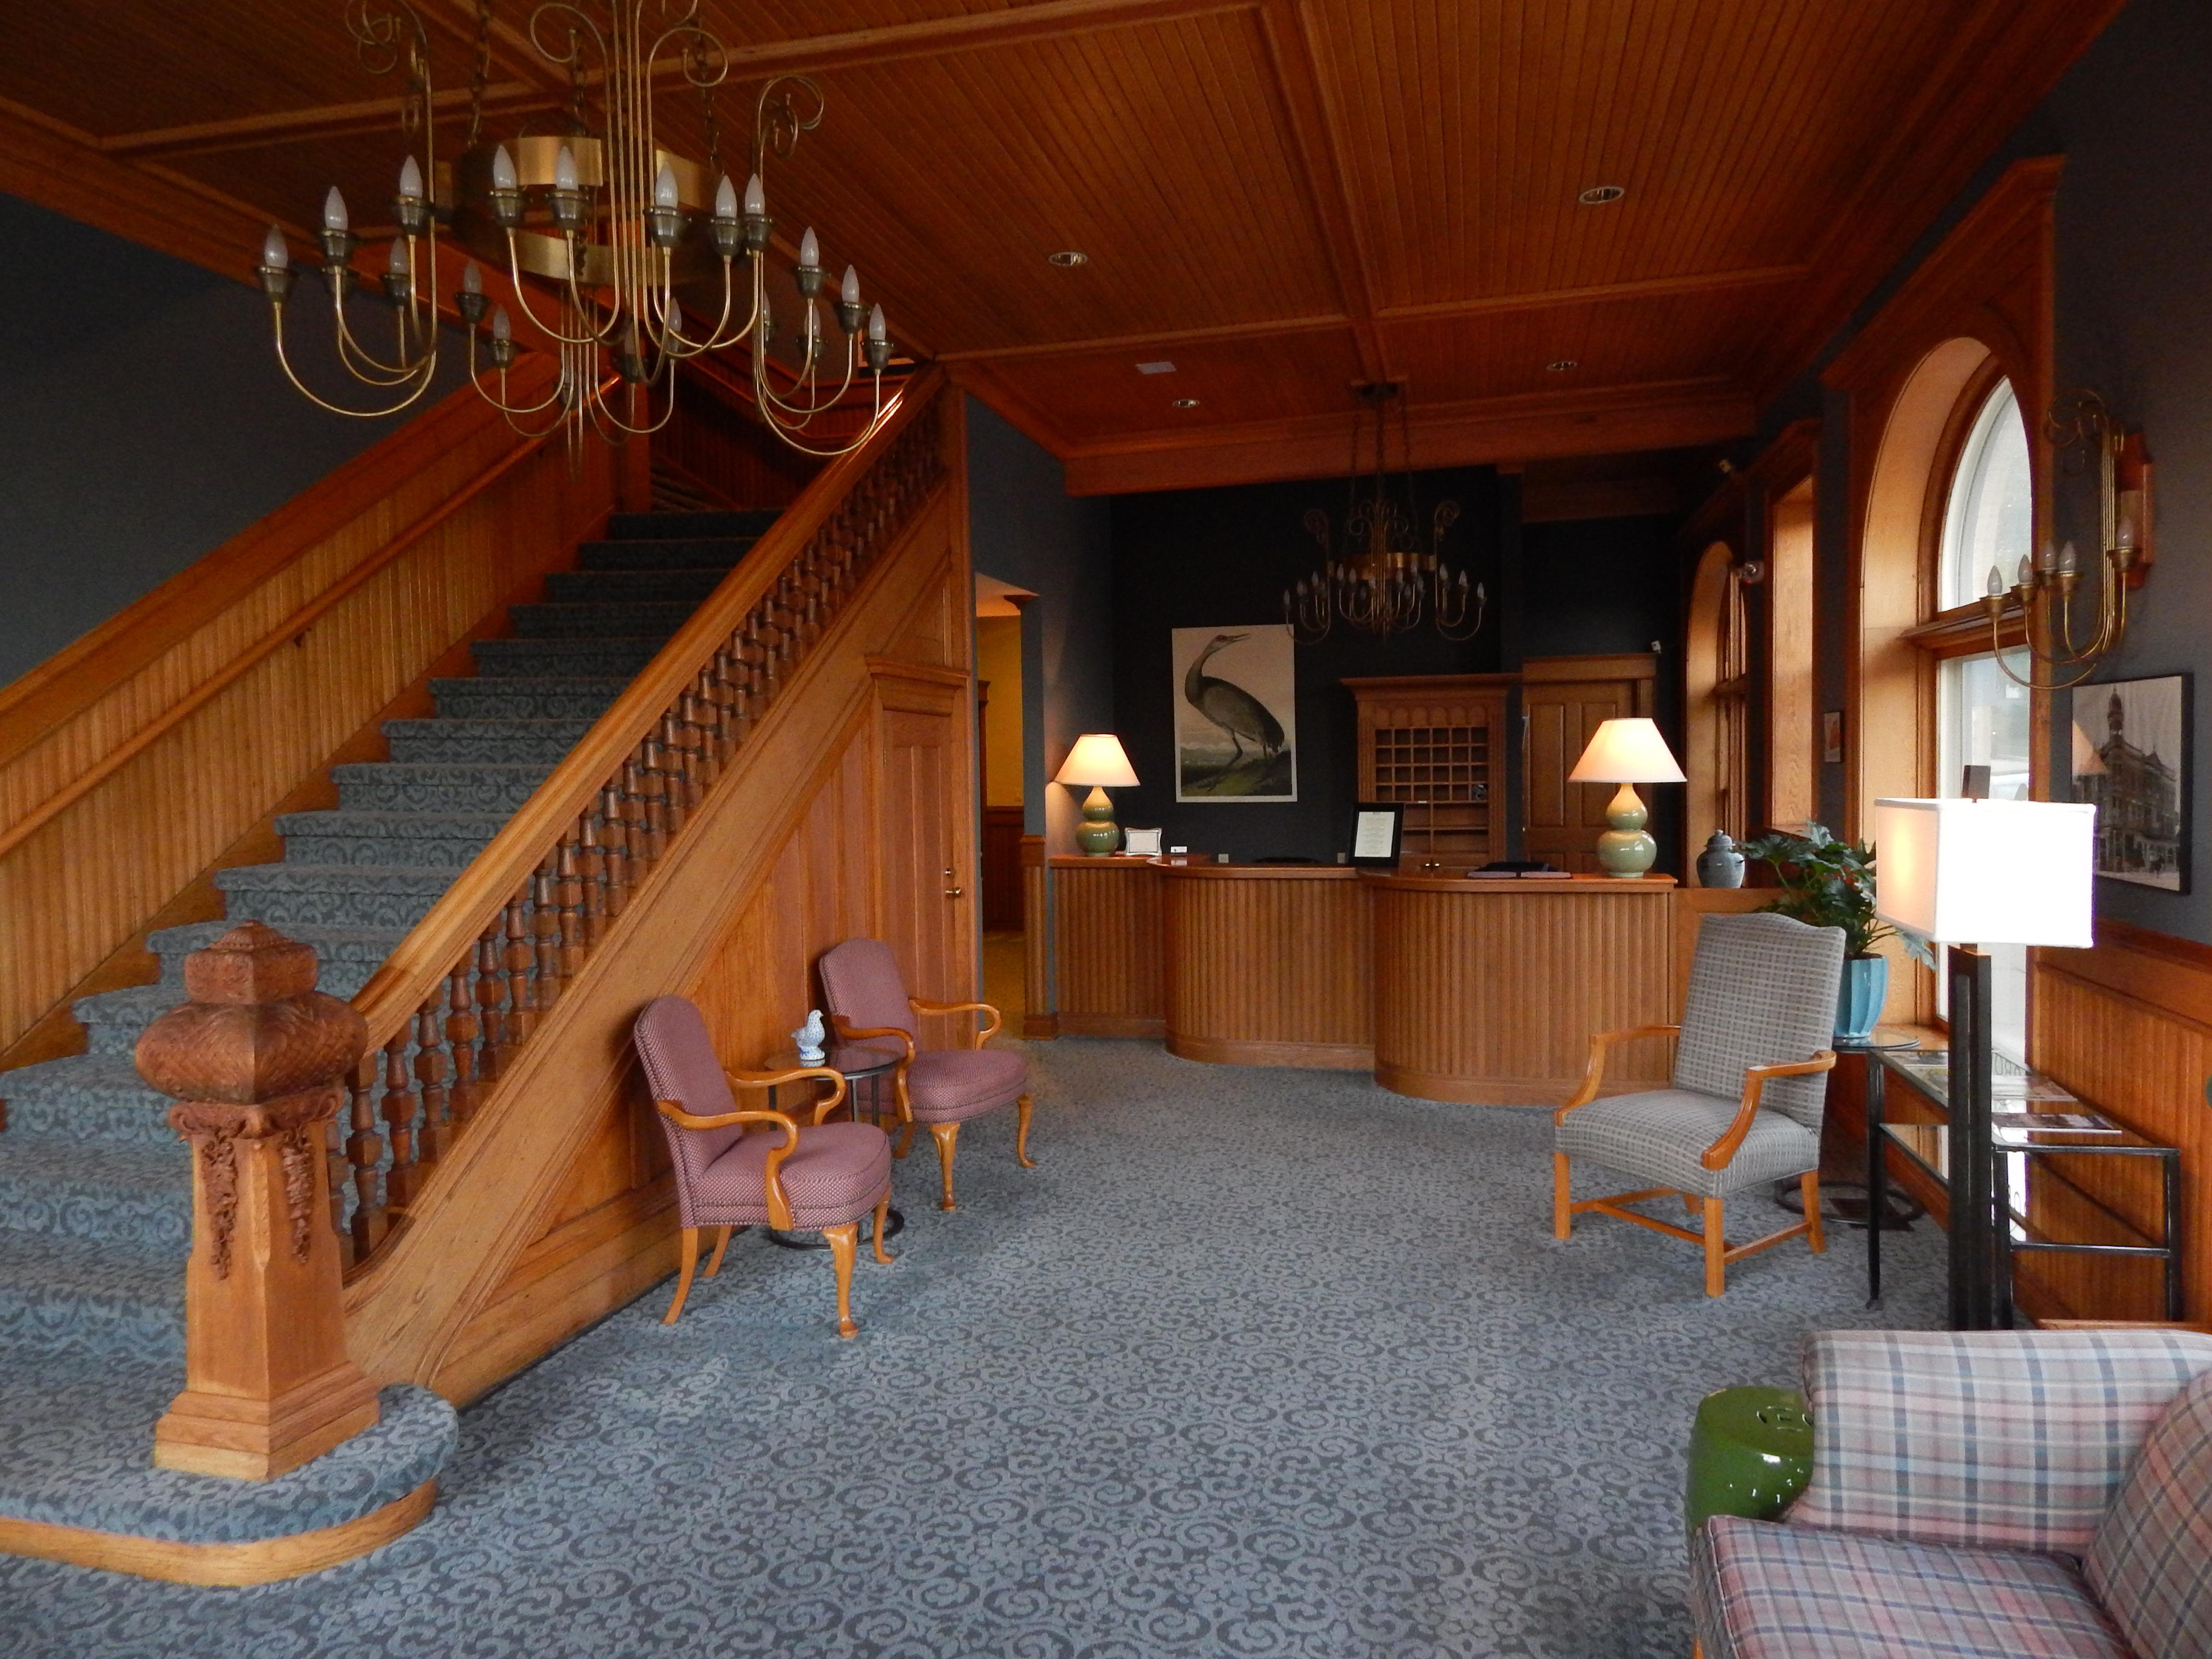 audubon-inn-lobby-ann-johnson-kingdom-venturers